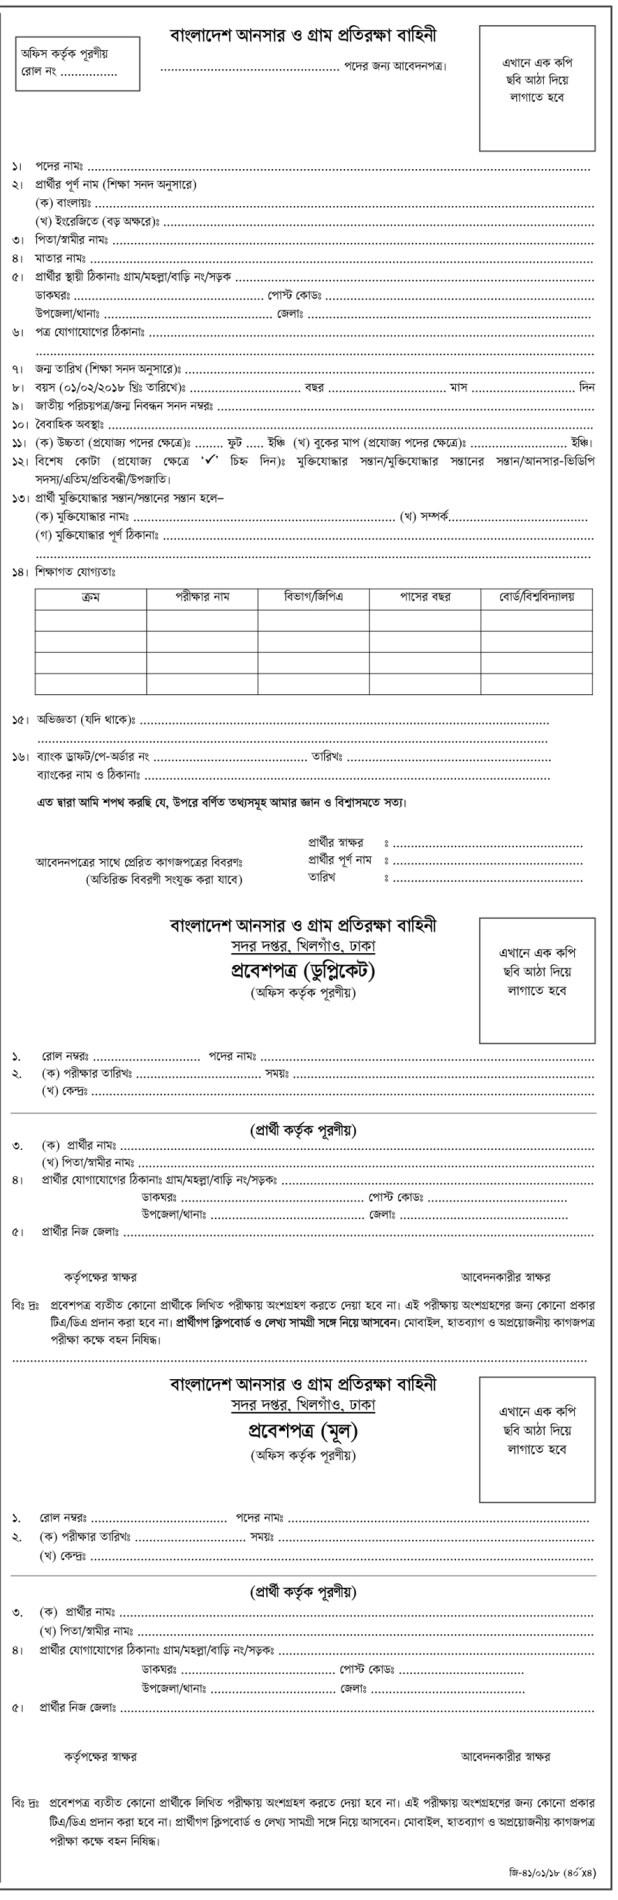 Bd Jobs: Govt Jobs In Bangladesh | Ansar VDP Job Circular 2018